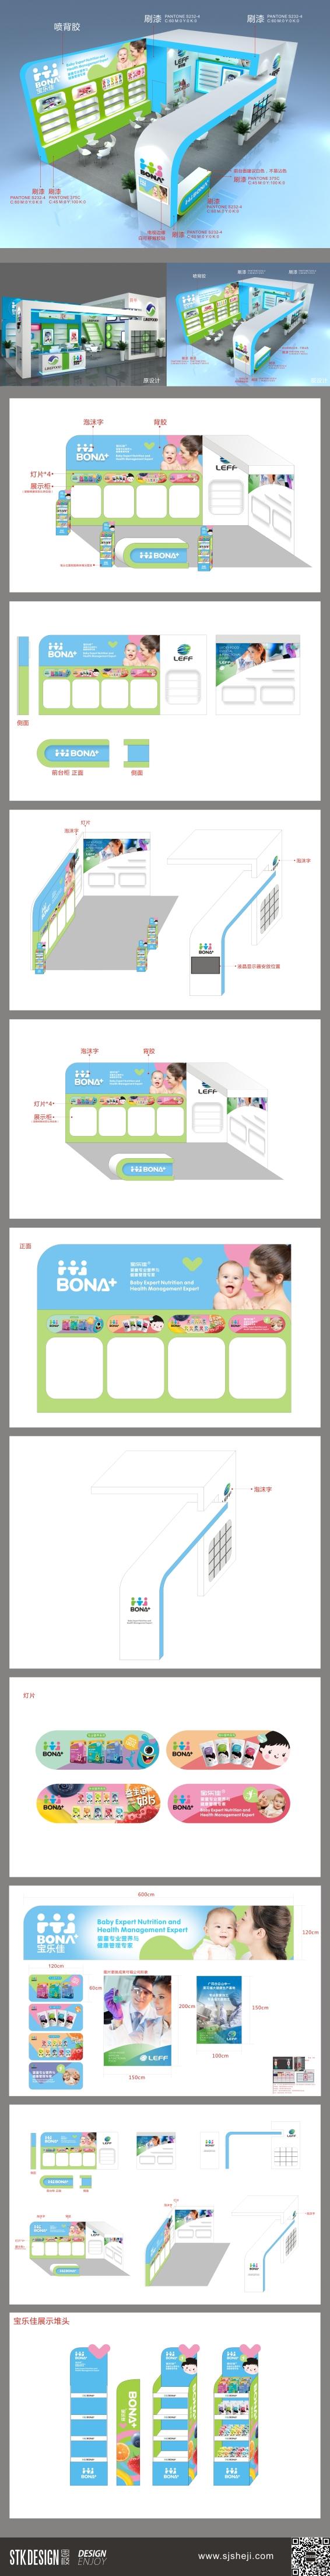 BONA+展会平面布局设计